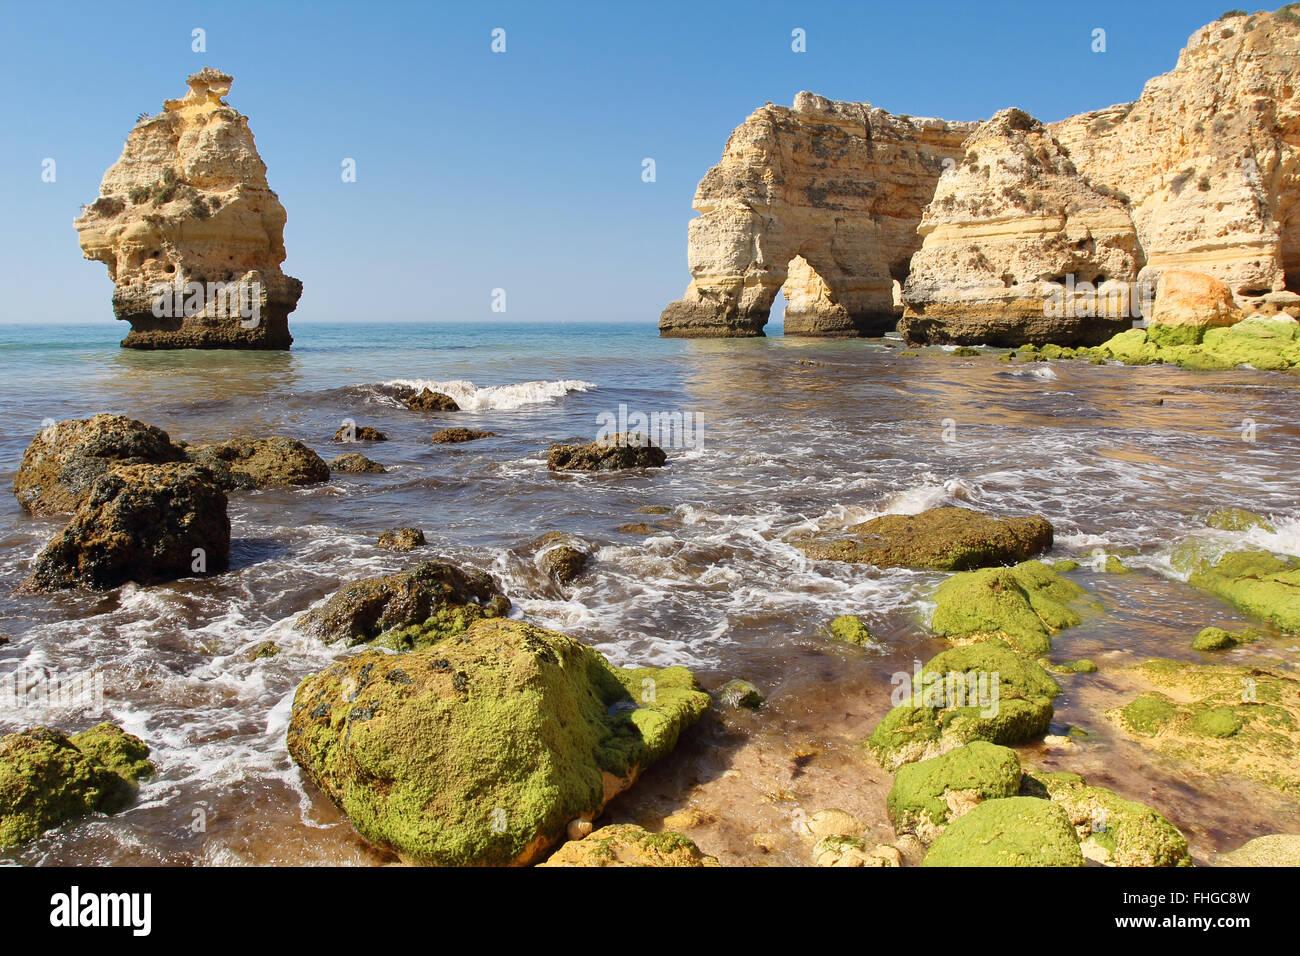 Beautiful Praia da marinha in Algarve . South Portugal Stock Photo